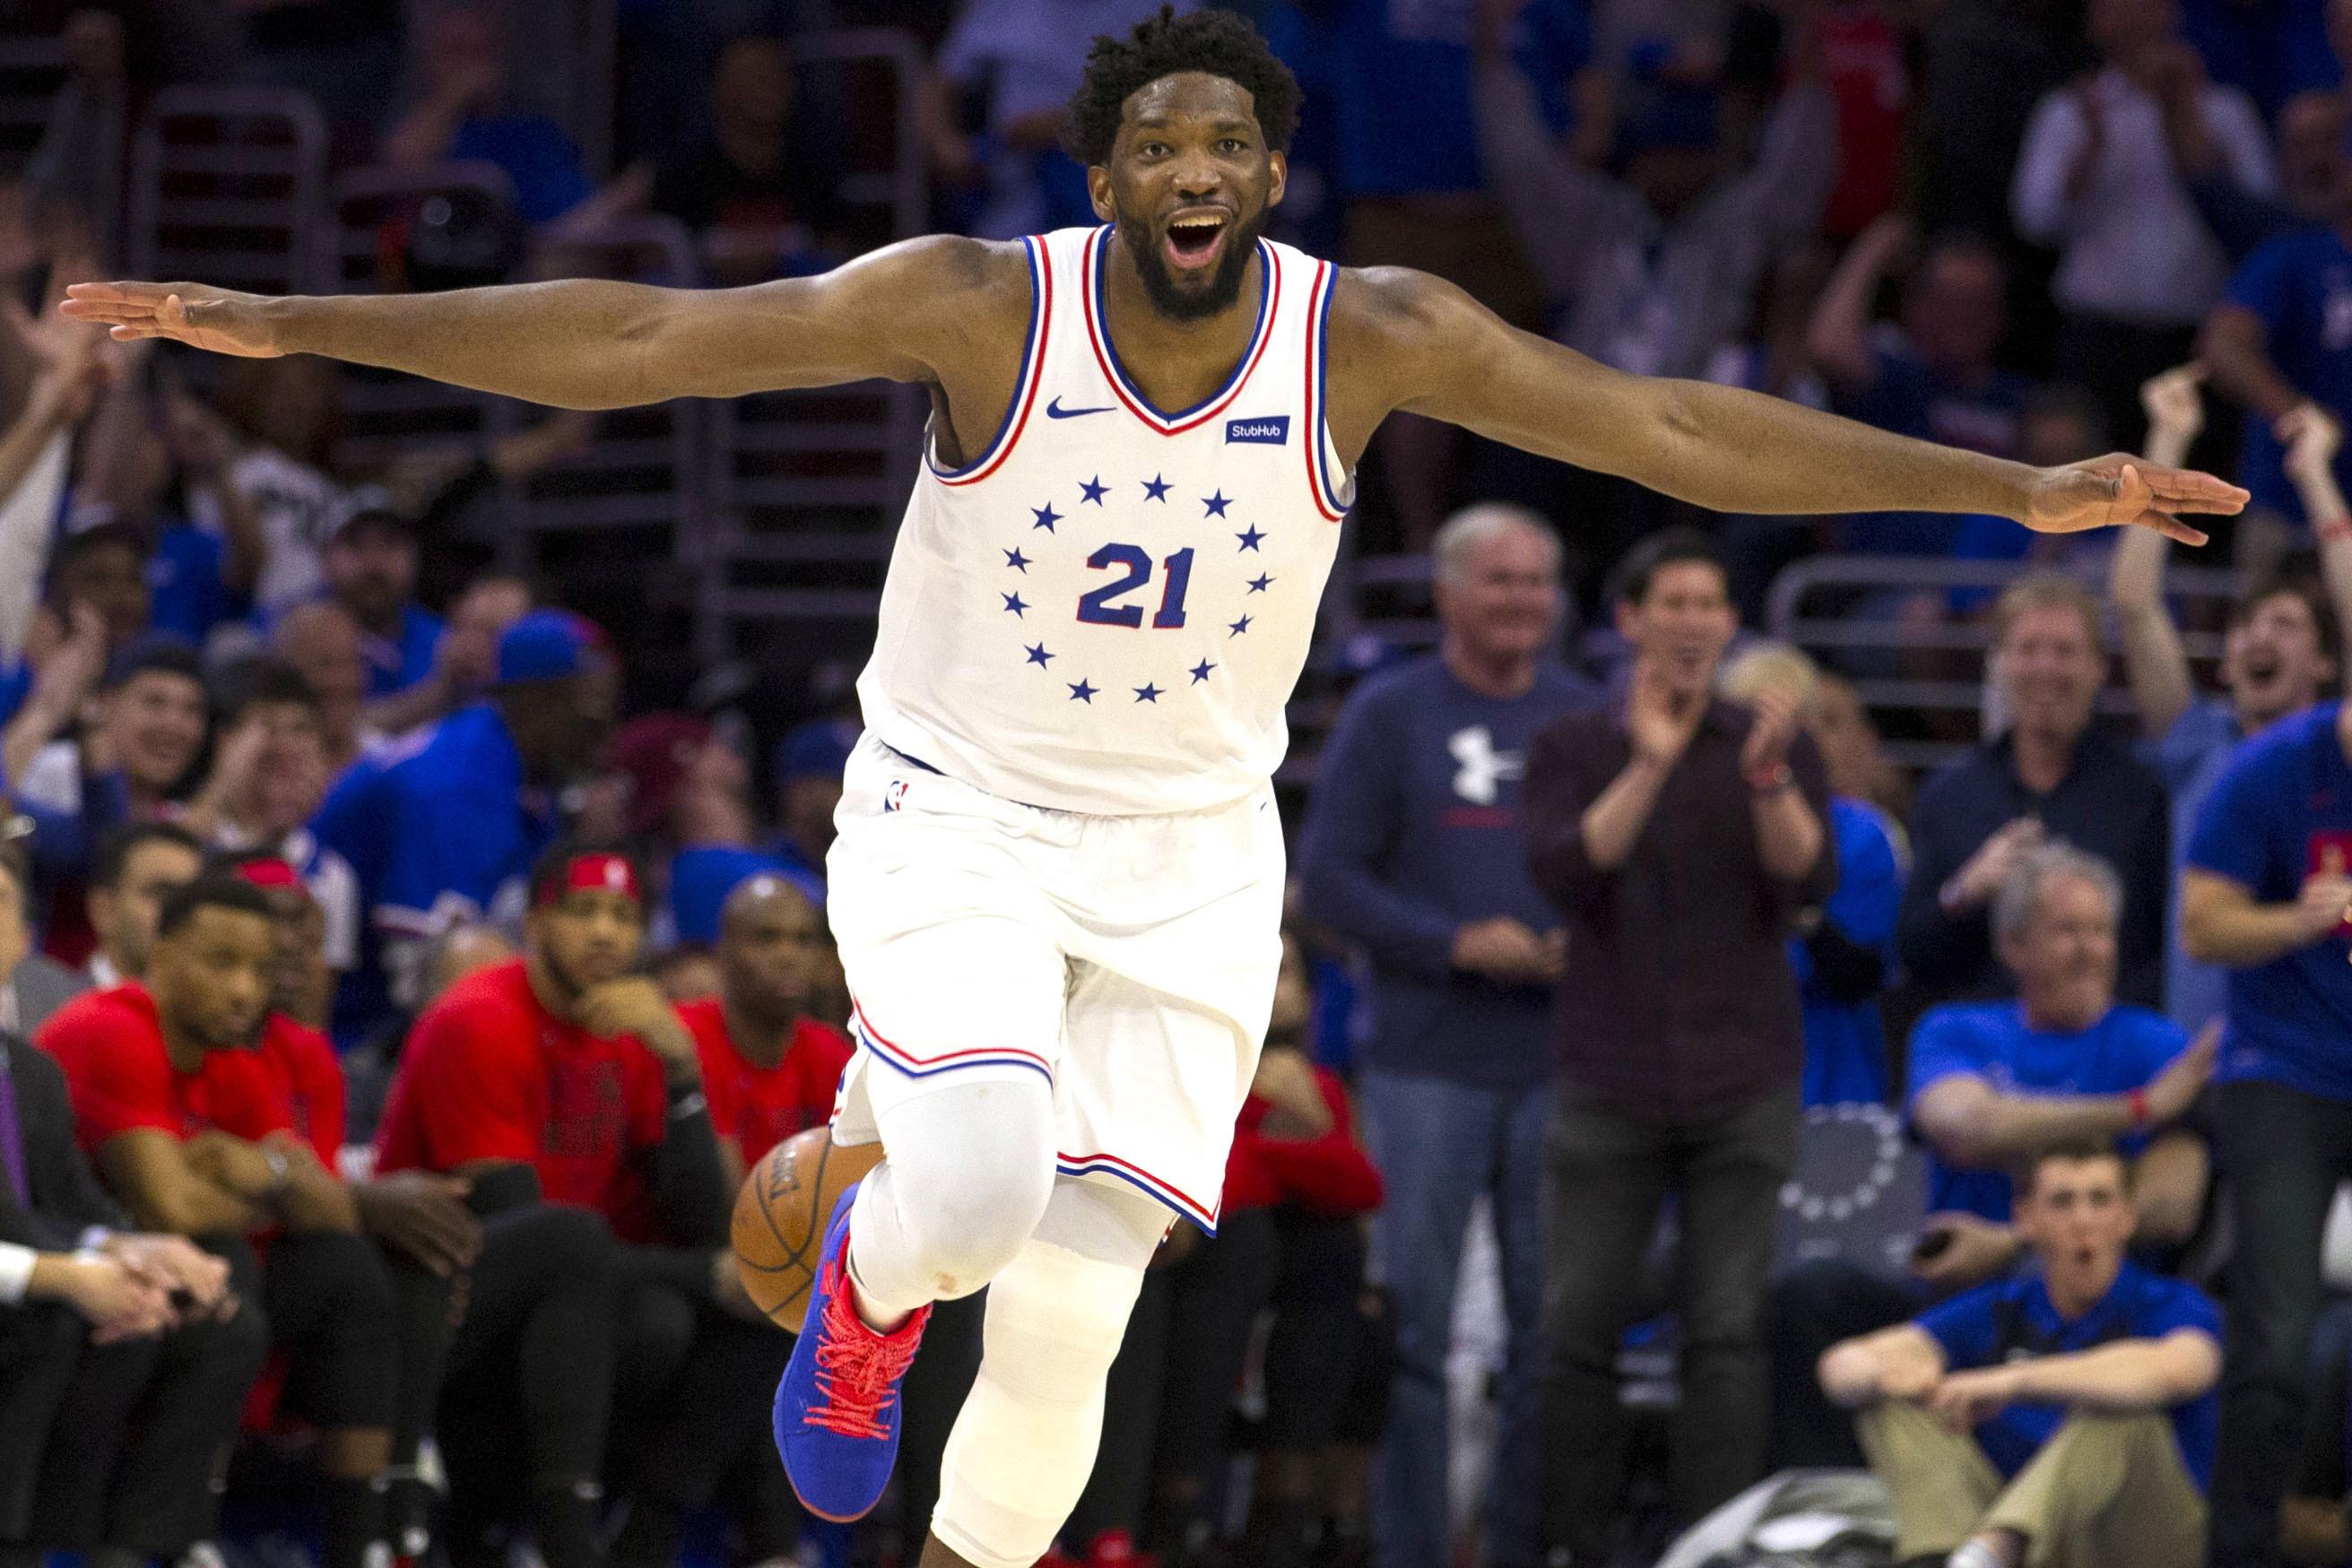 NBA Recap: Embiid Dominates As Sixers take 2-1 Lead On Raptors